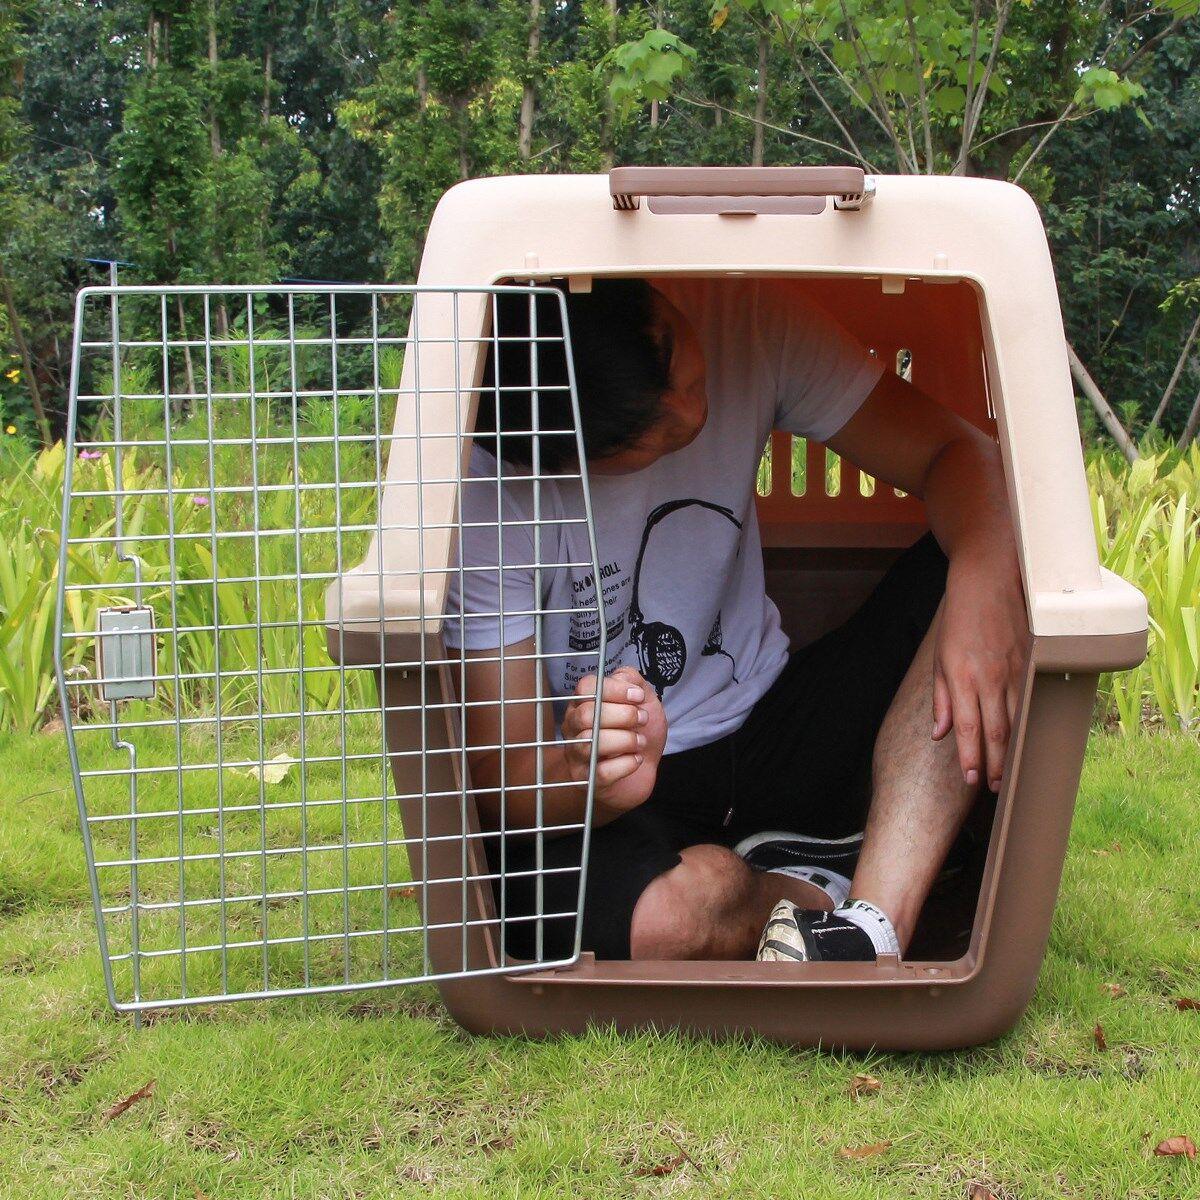 Harga Diskon Hewan Peliharaan Anjing Kucing Kandang Kucing Keluar Portable Case Kebesaran Golden Retriever Anjing Kotak Centang Transportasi Batang Tarik Kotak Hari Ini